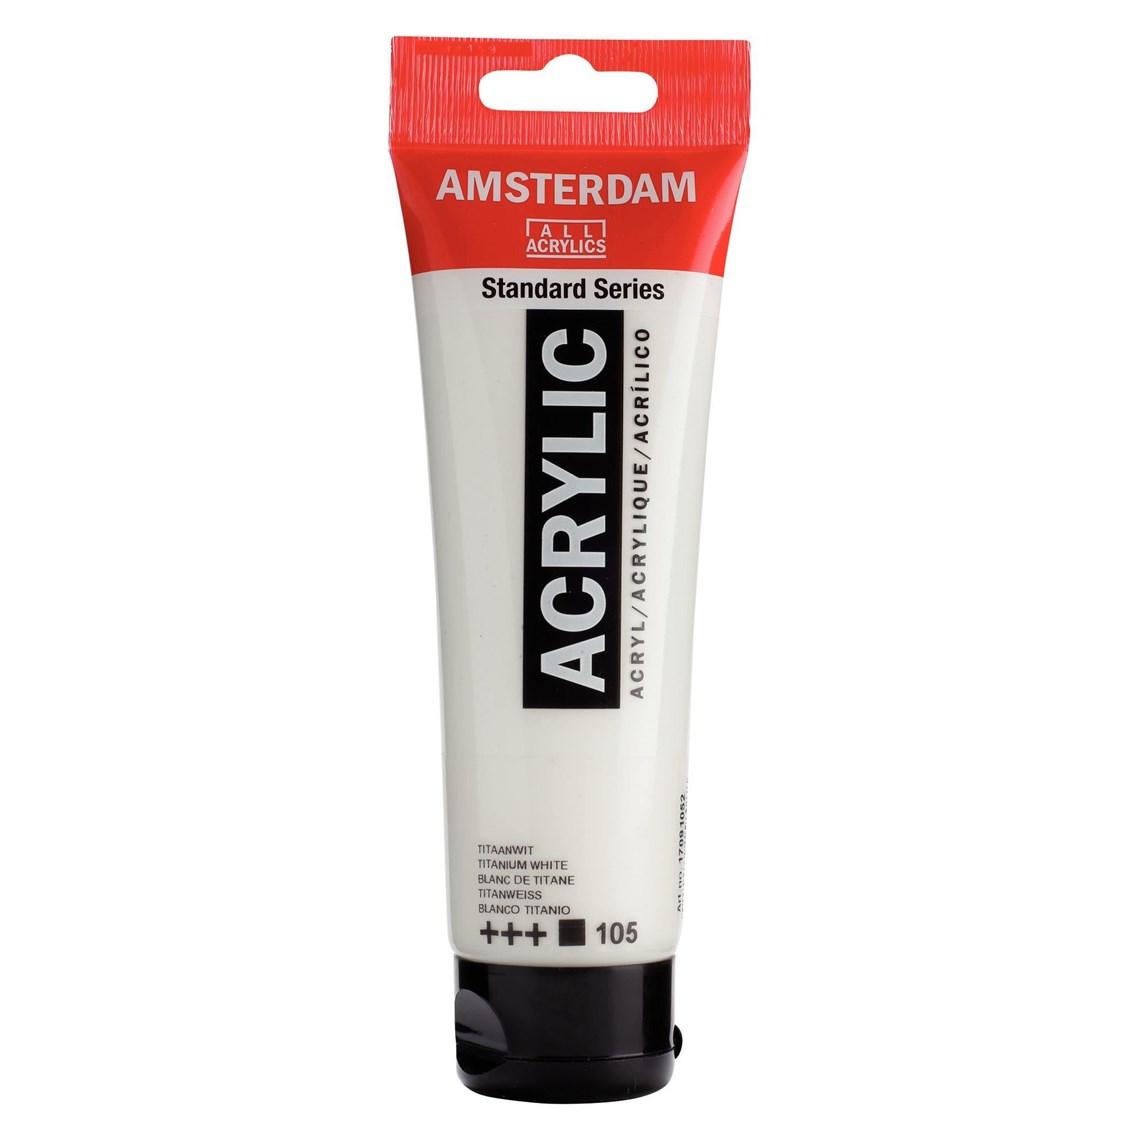 Amsterdam acrylverf Titaanwit 105 Standard Series